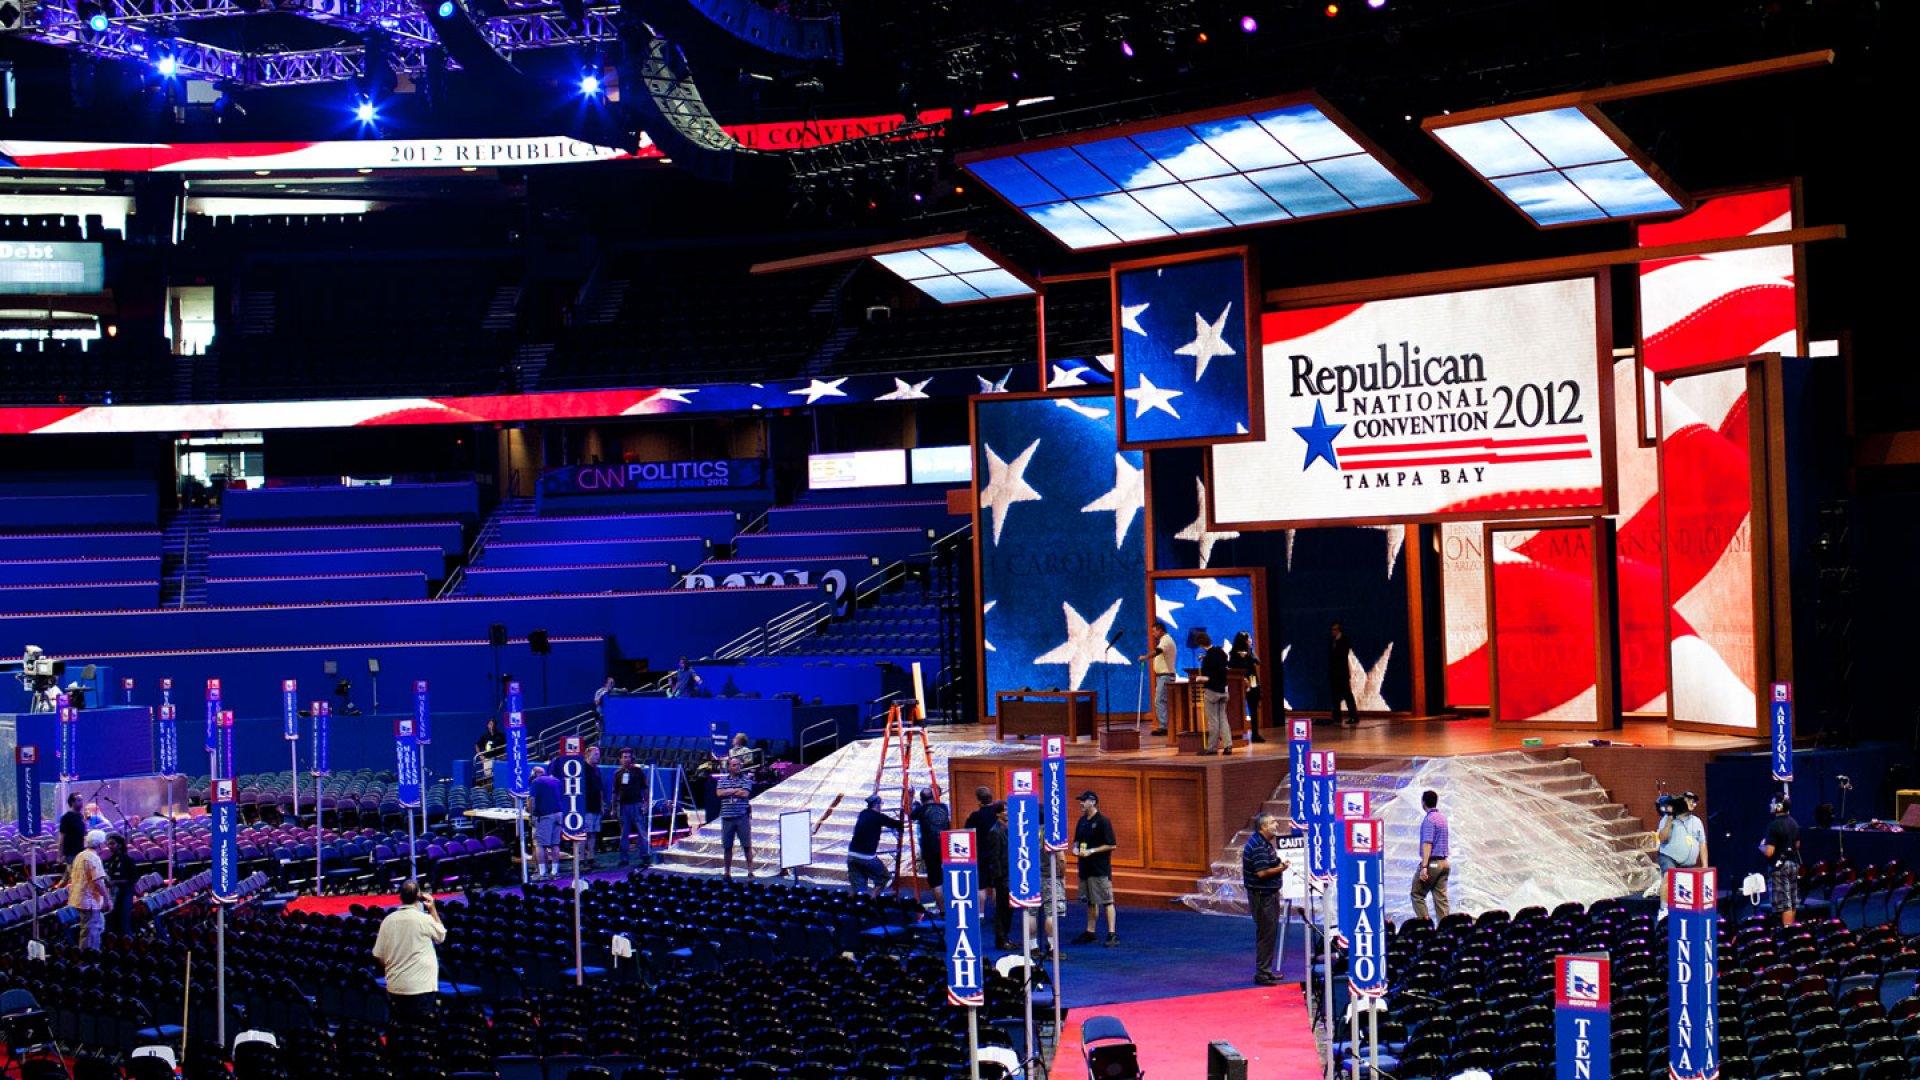 Entrepreneurship Front & Center at Republican National Convention